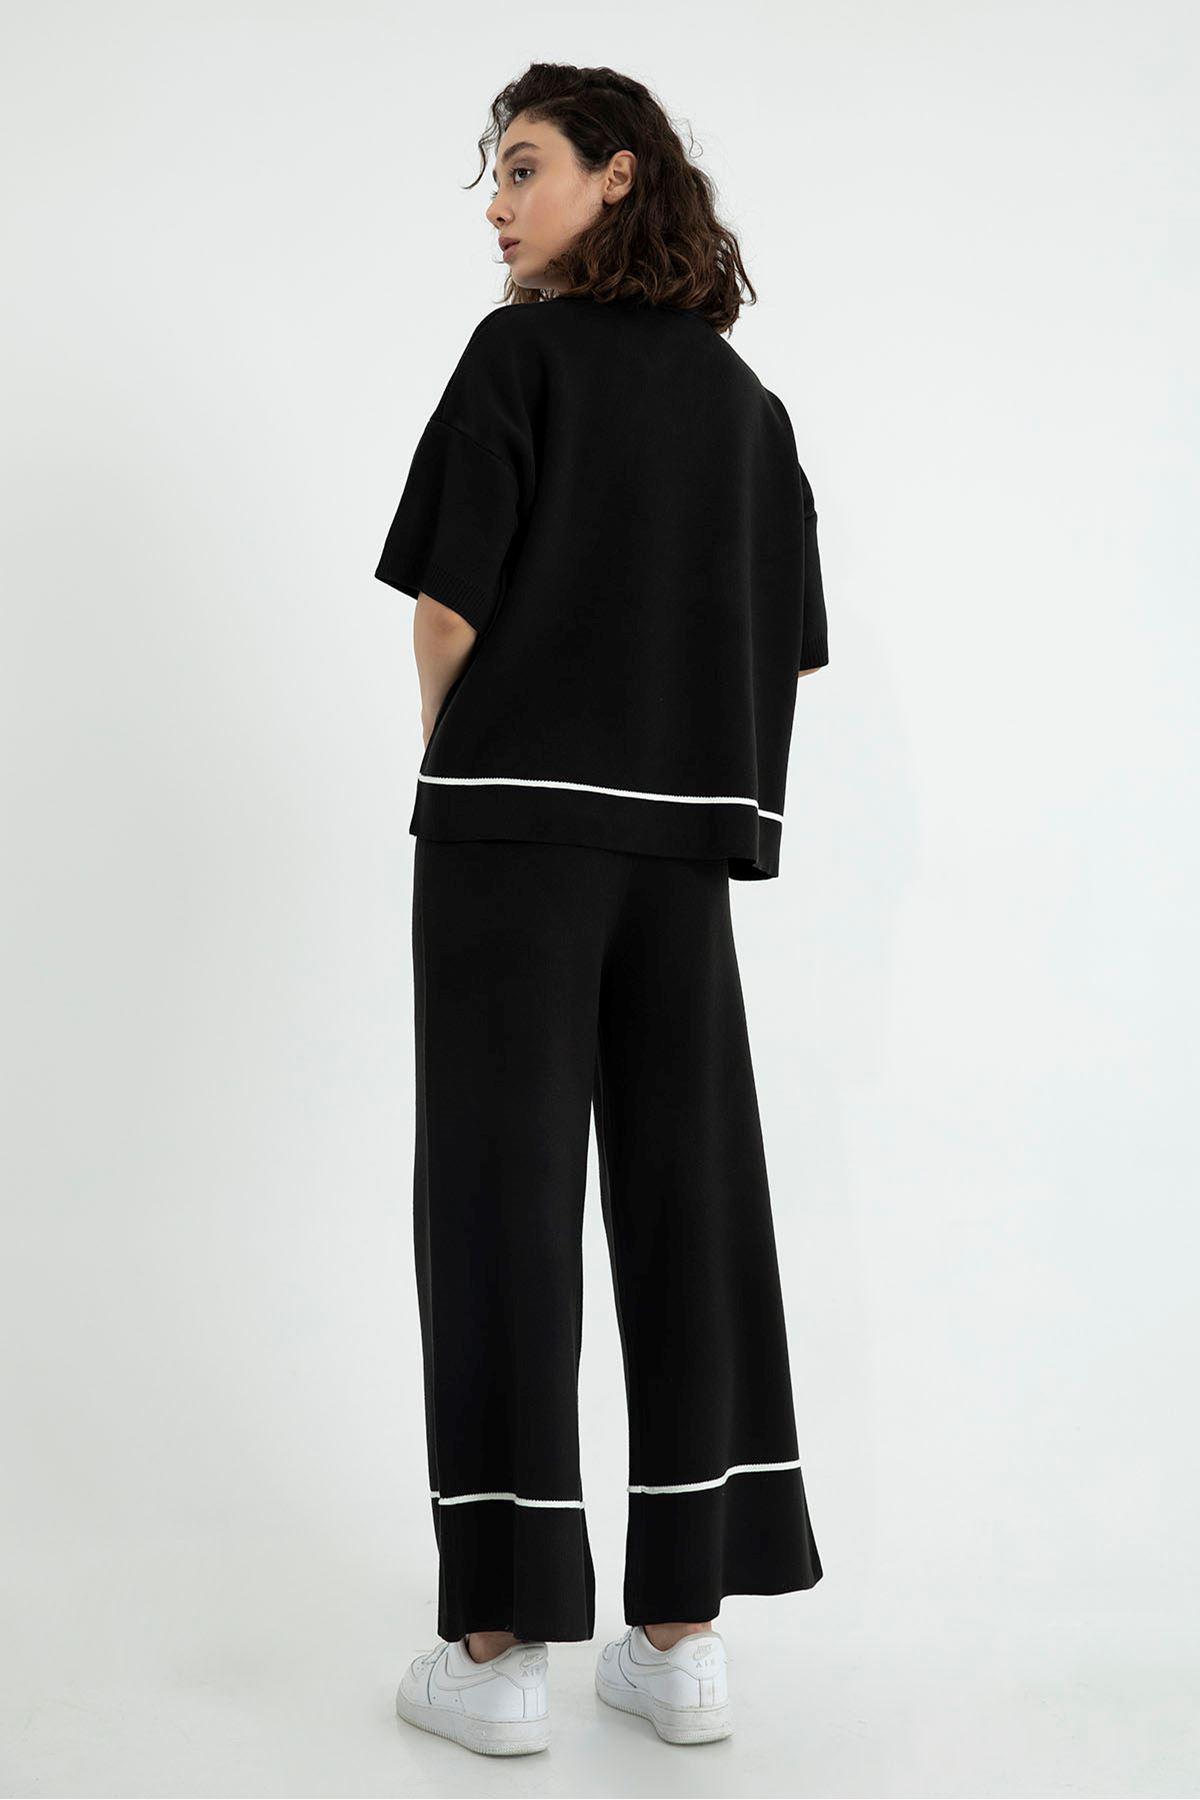 Çizgi Detay Salaş Triko Takım-Siyah